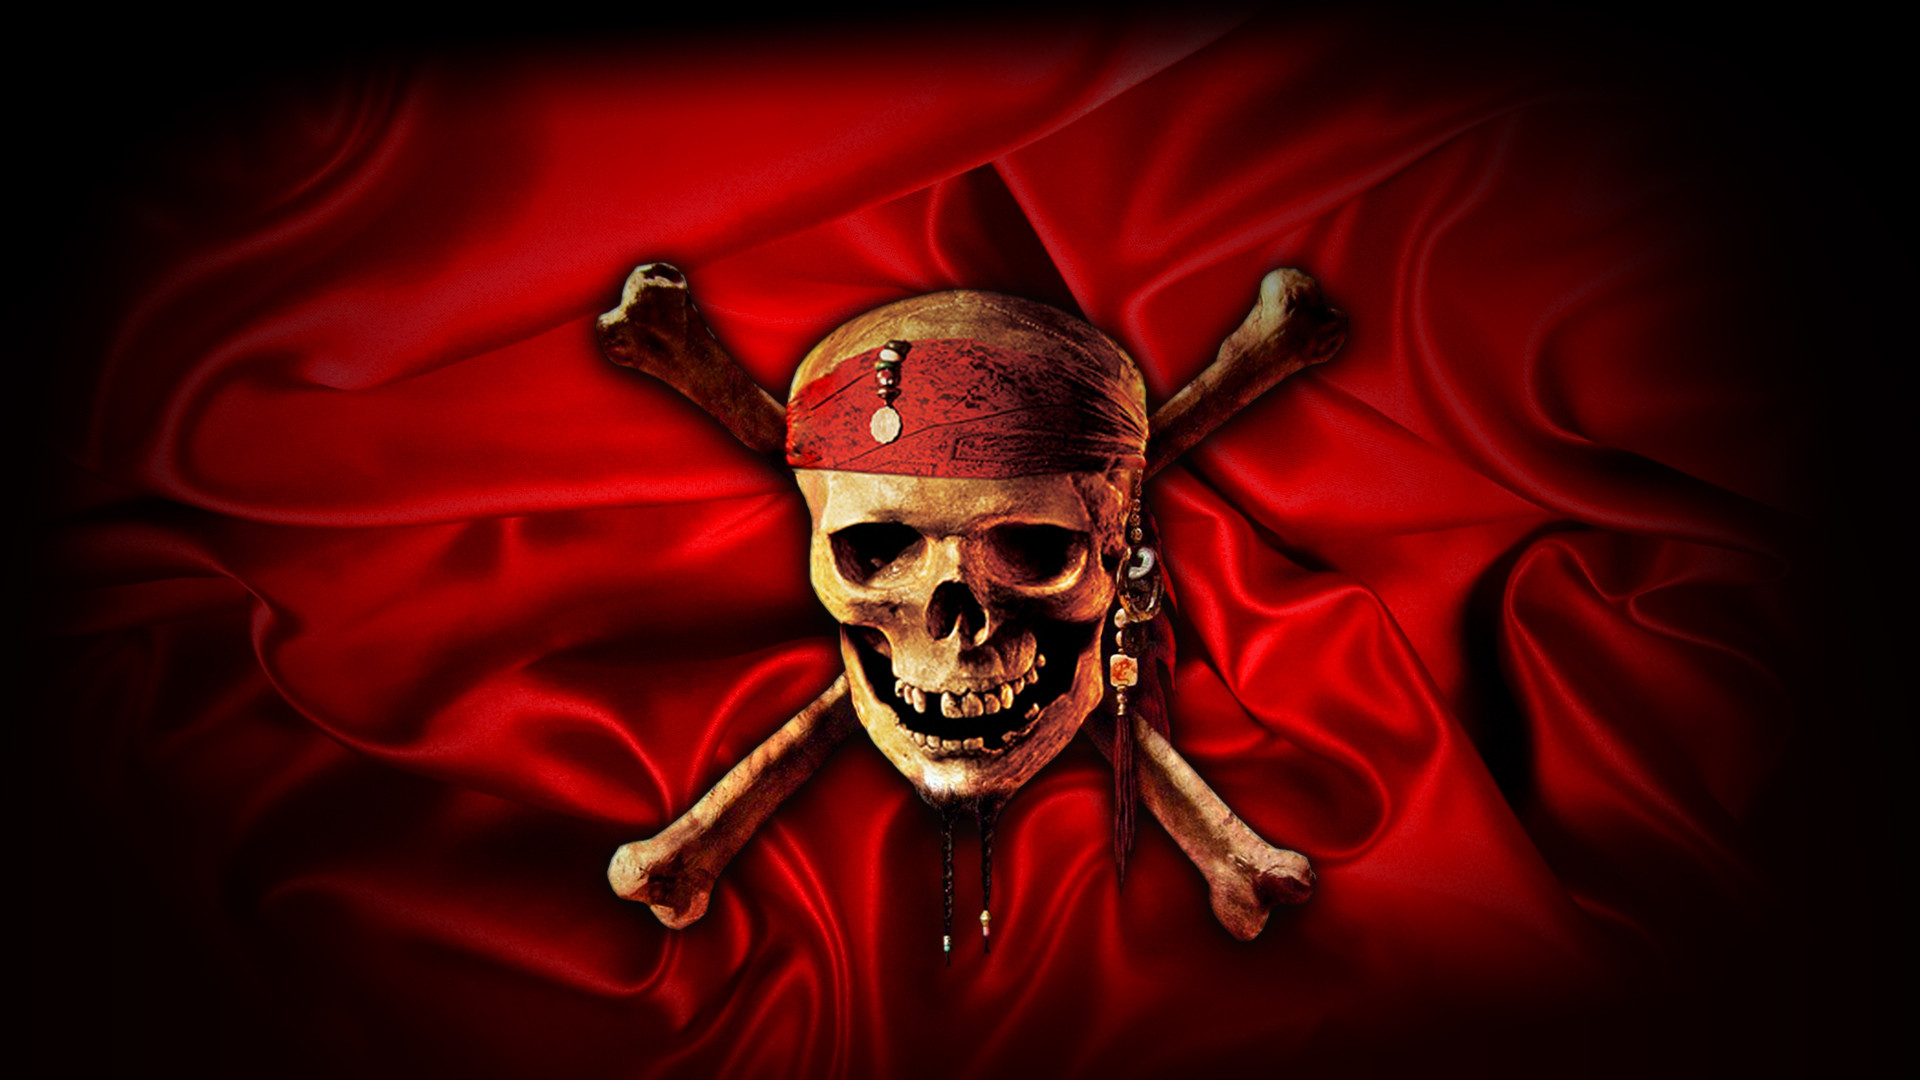 Movie Pirates Of The Caribbean: At World's End Skull Crossbones Wallpaper